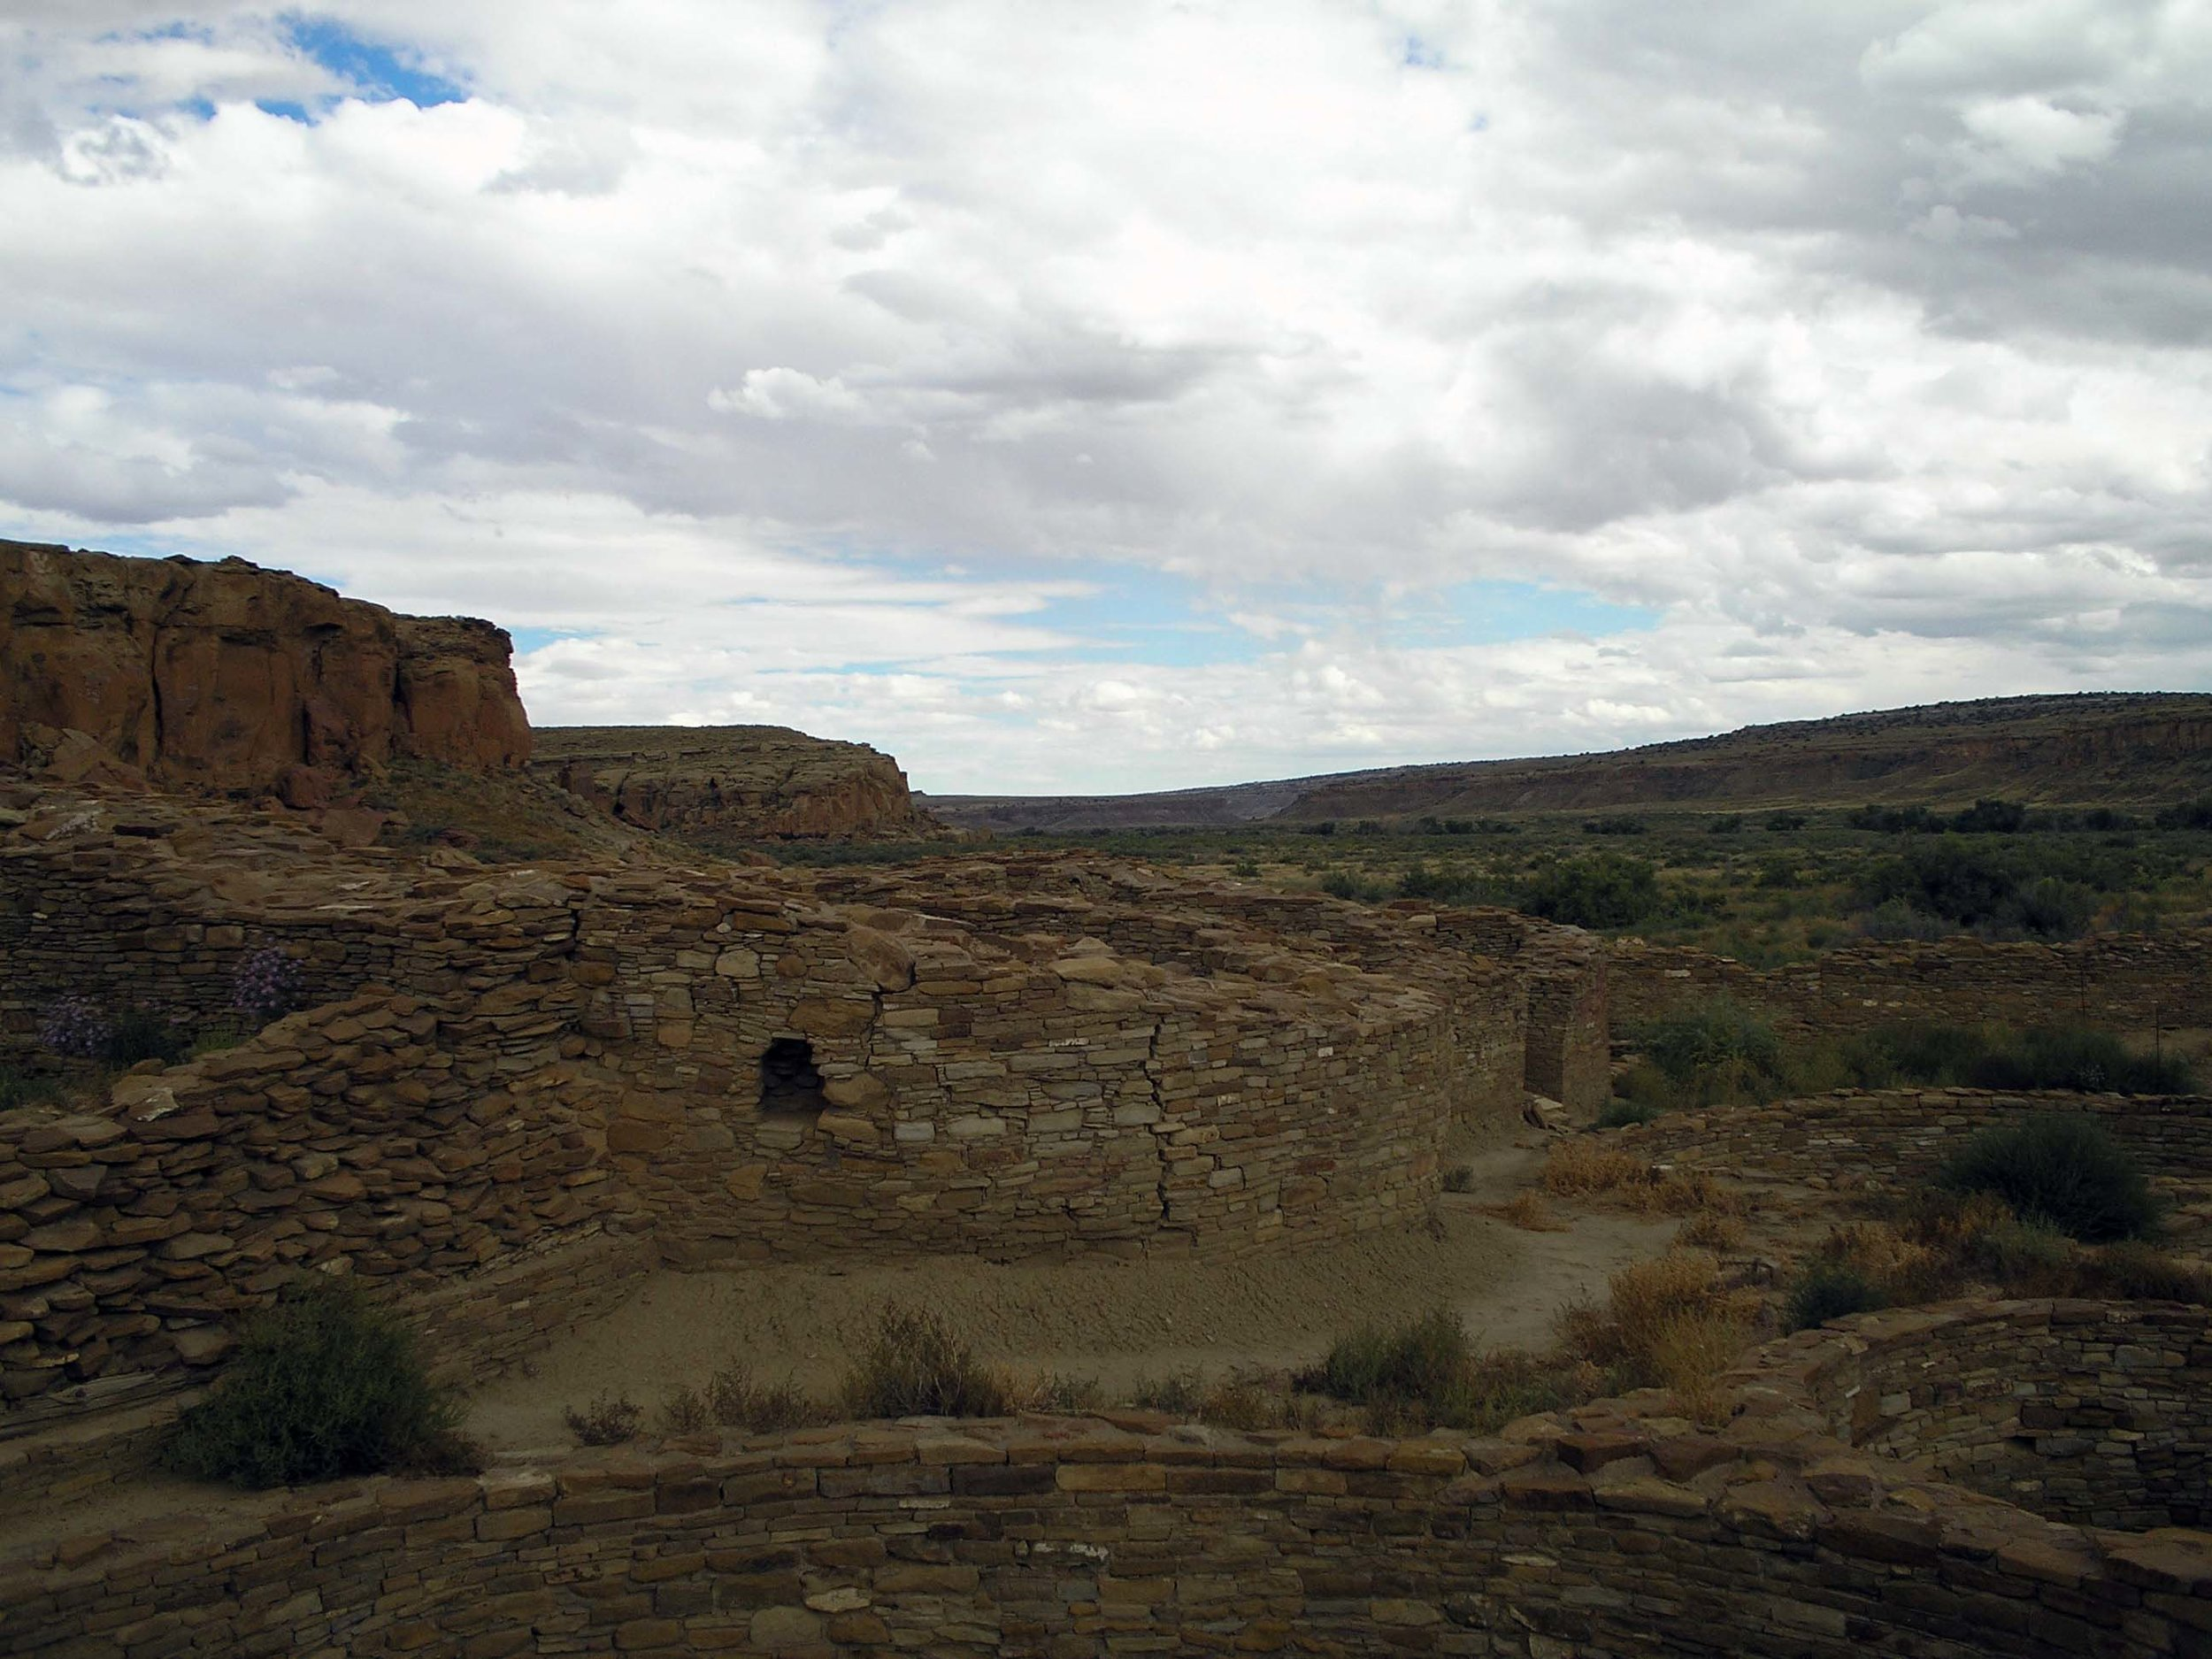 chaco canyon 7.jpg